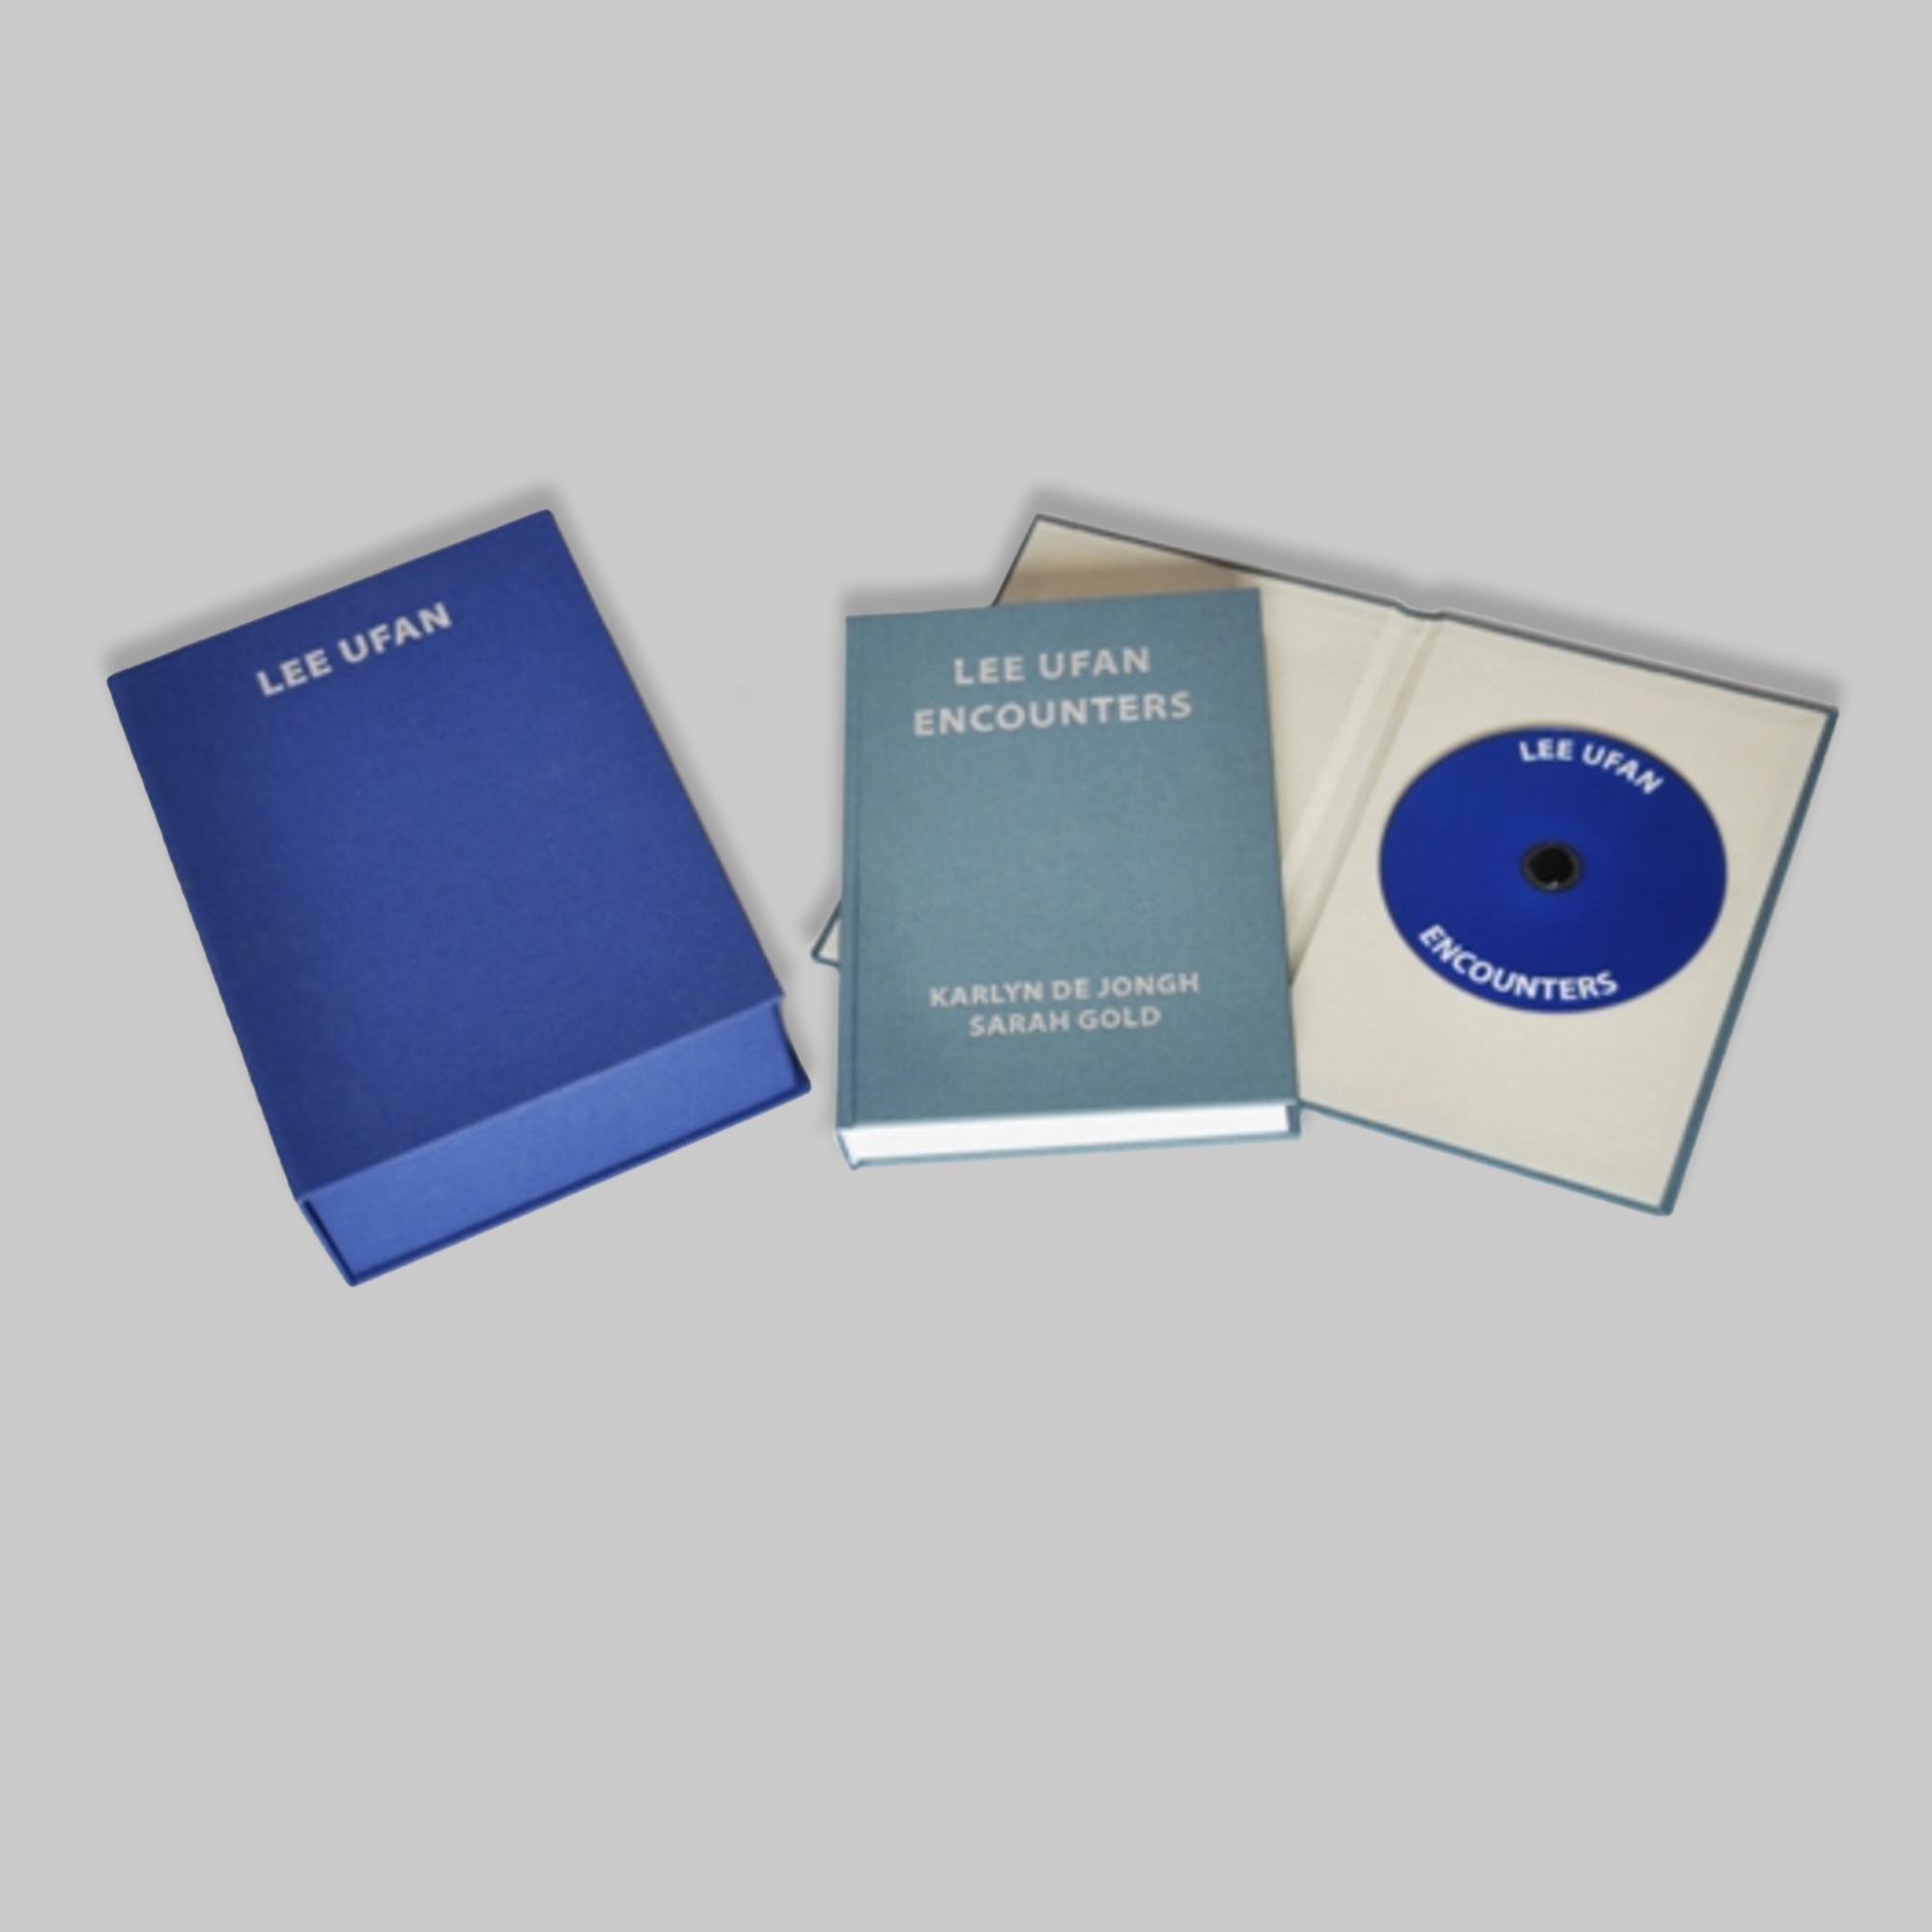 Lee-Ufan-Encounters-Standard-Edition-of-50-copies-